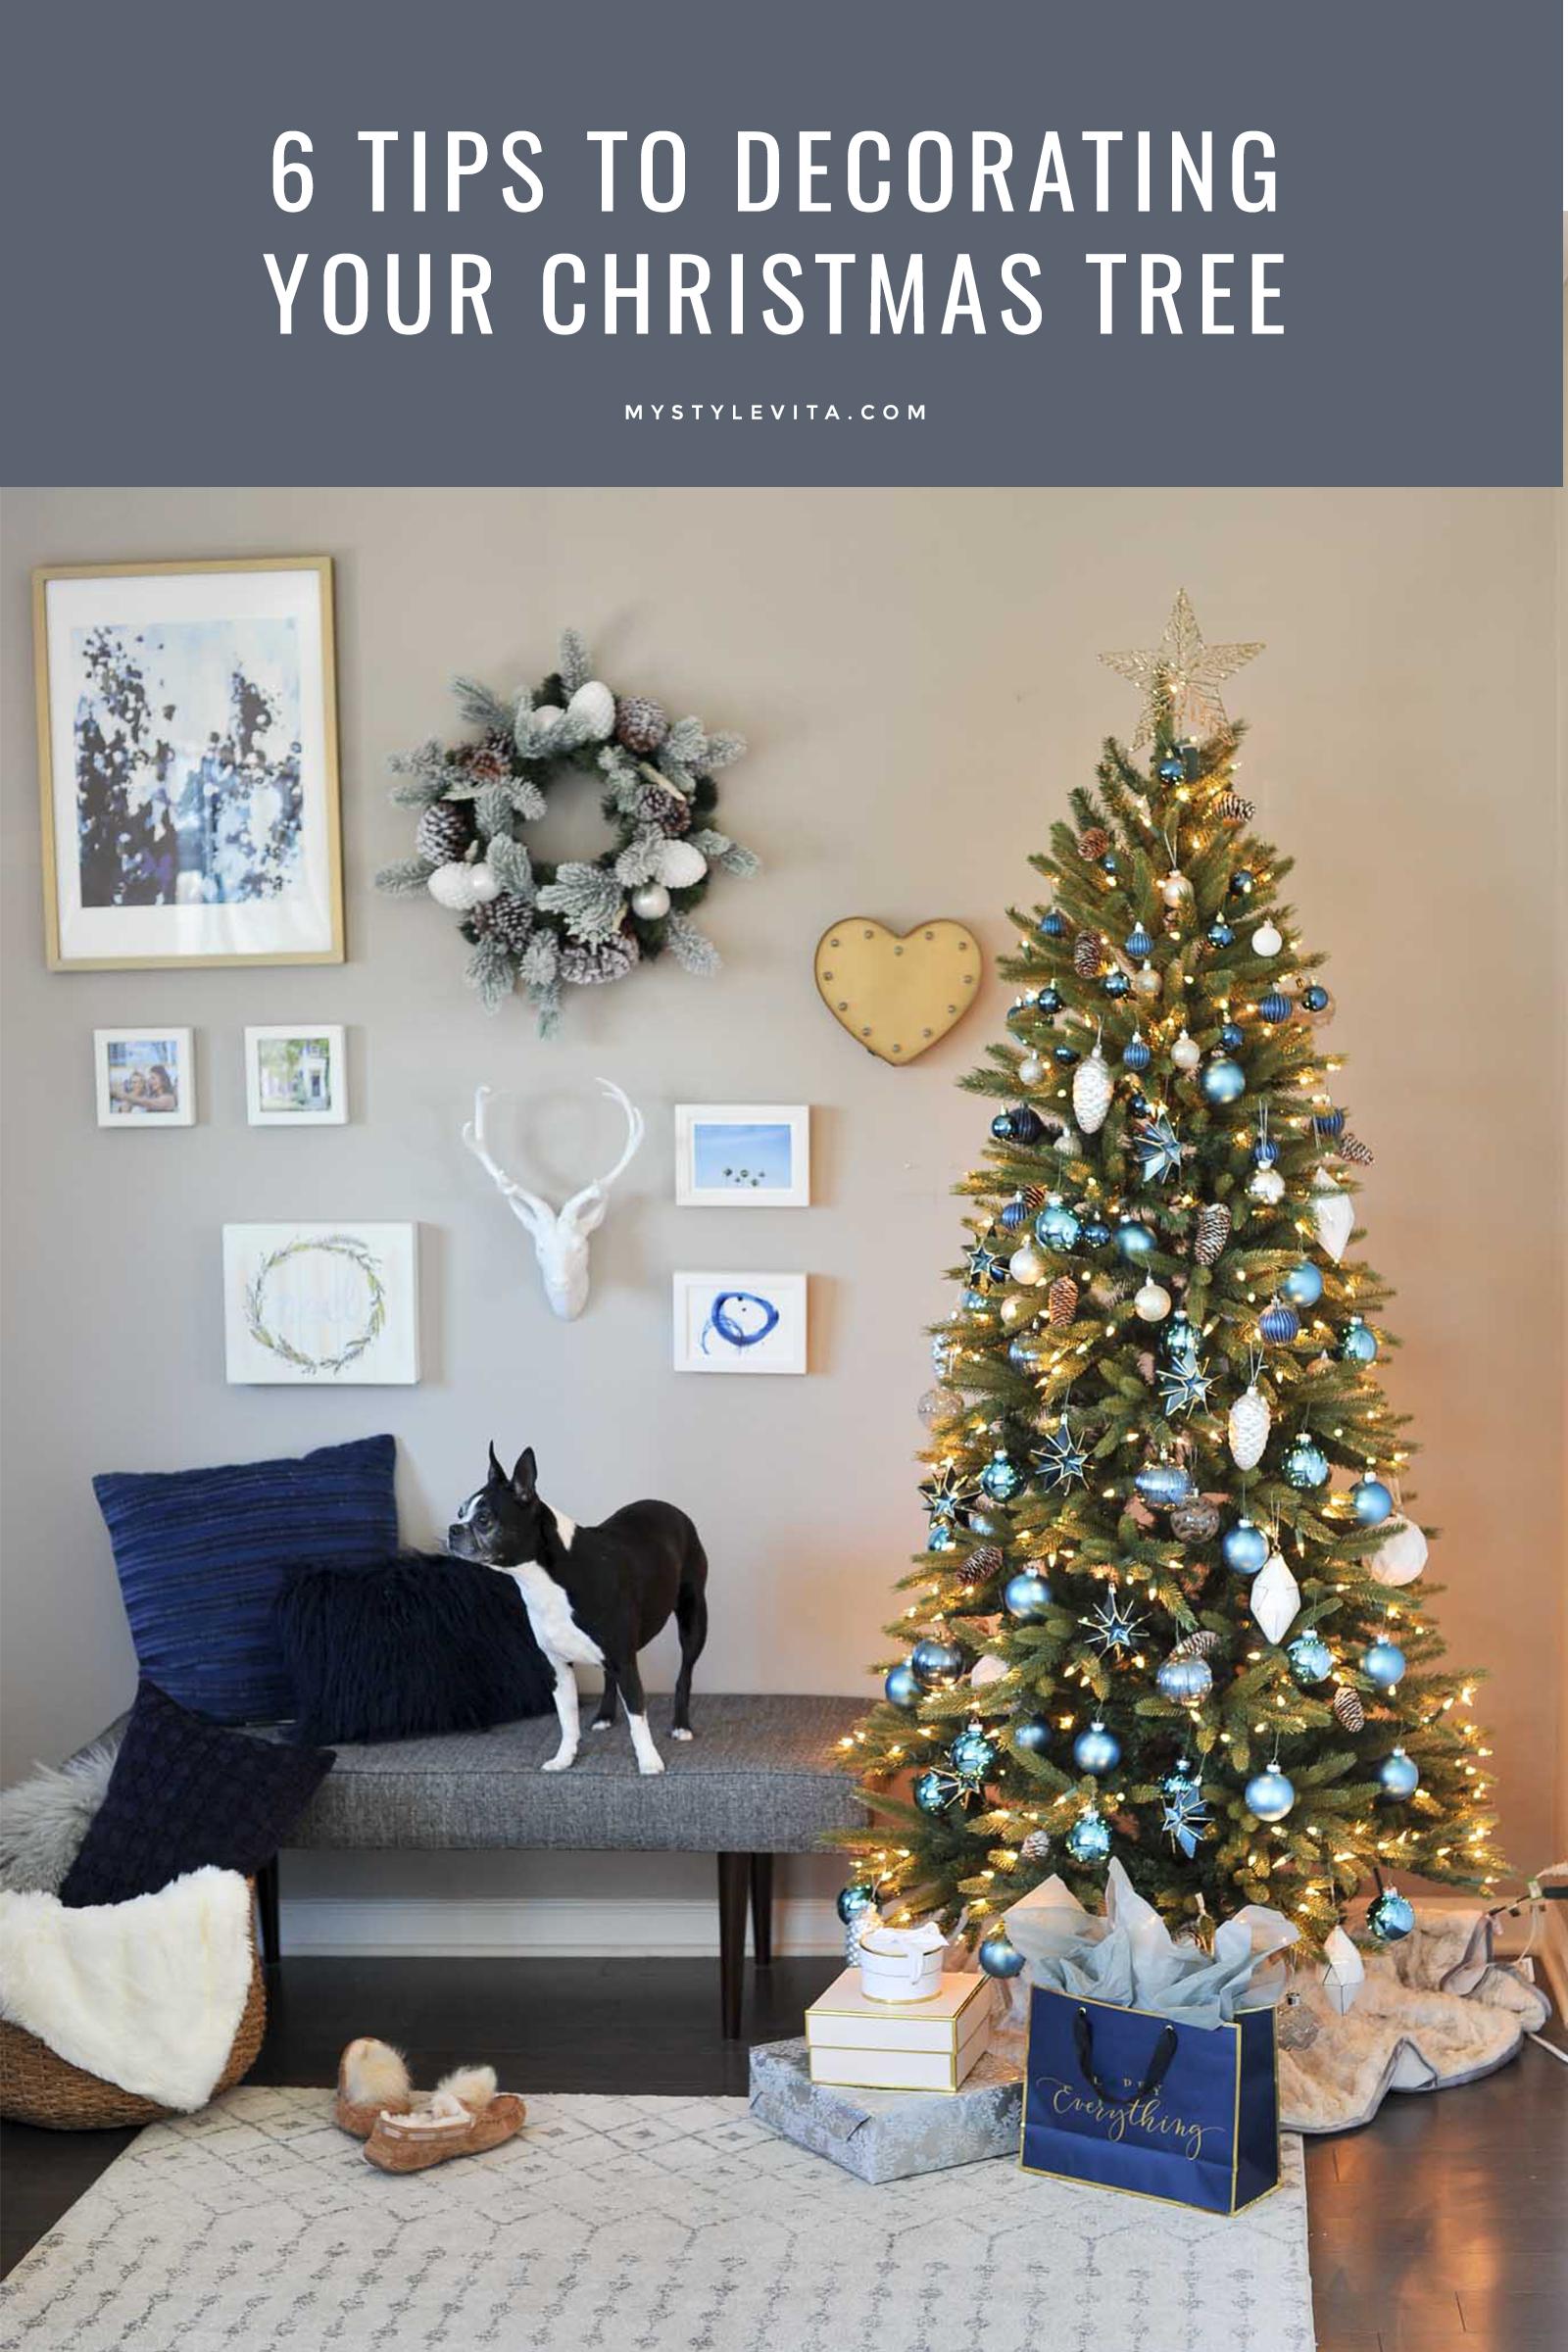 6 Tips To Creating A Pretty Christmas Tree | Blue christmas decor ...